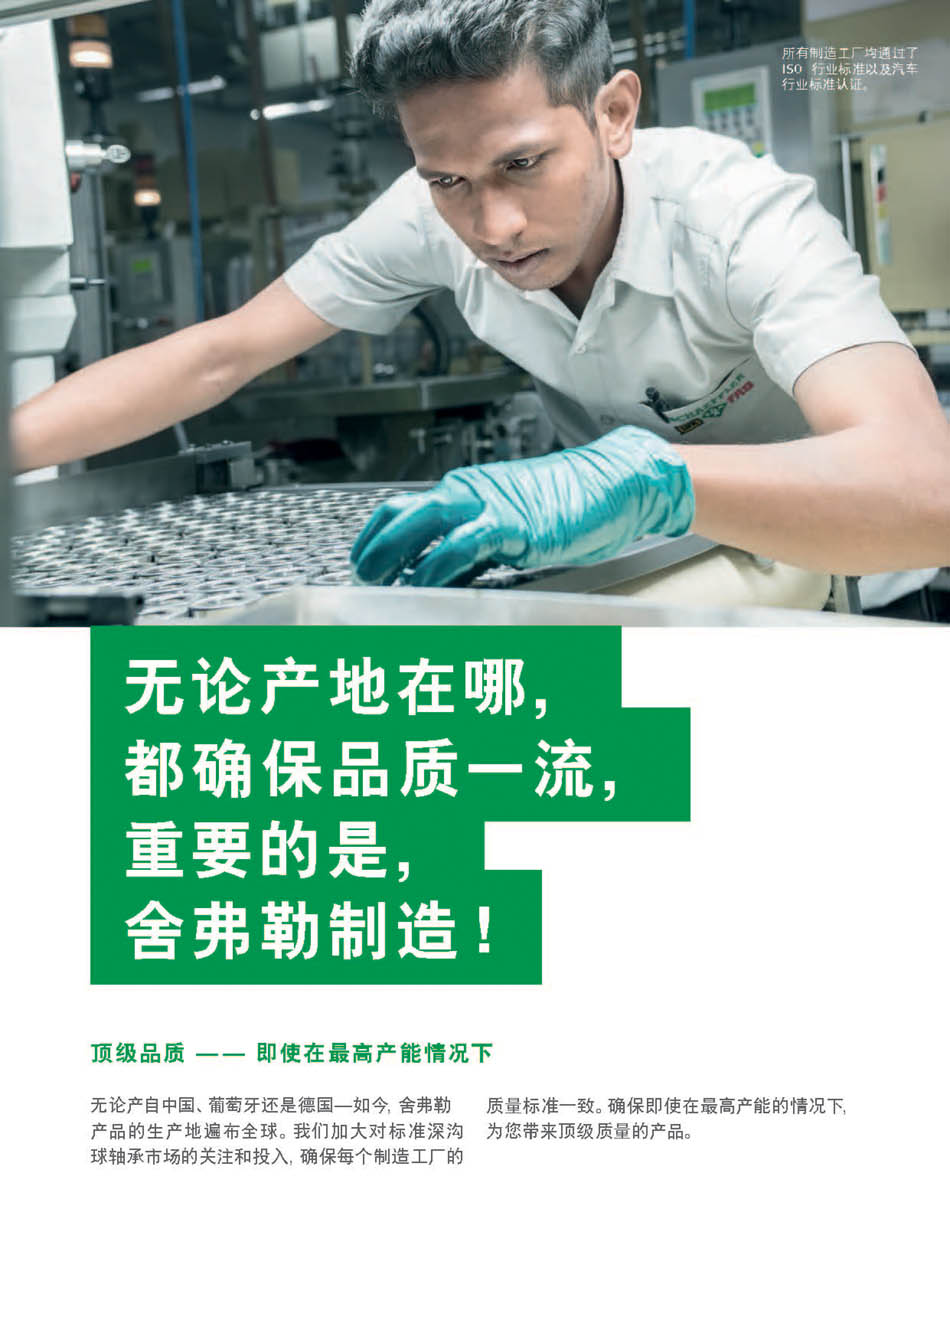 Brochure_GenerationC_CN_lowres4 (2)_页面_04.jpg